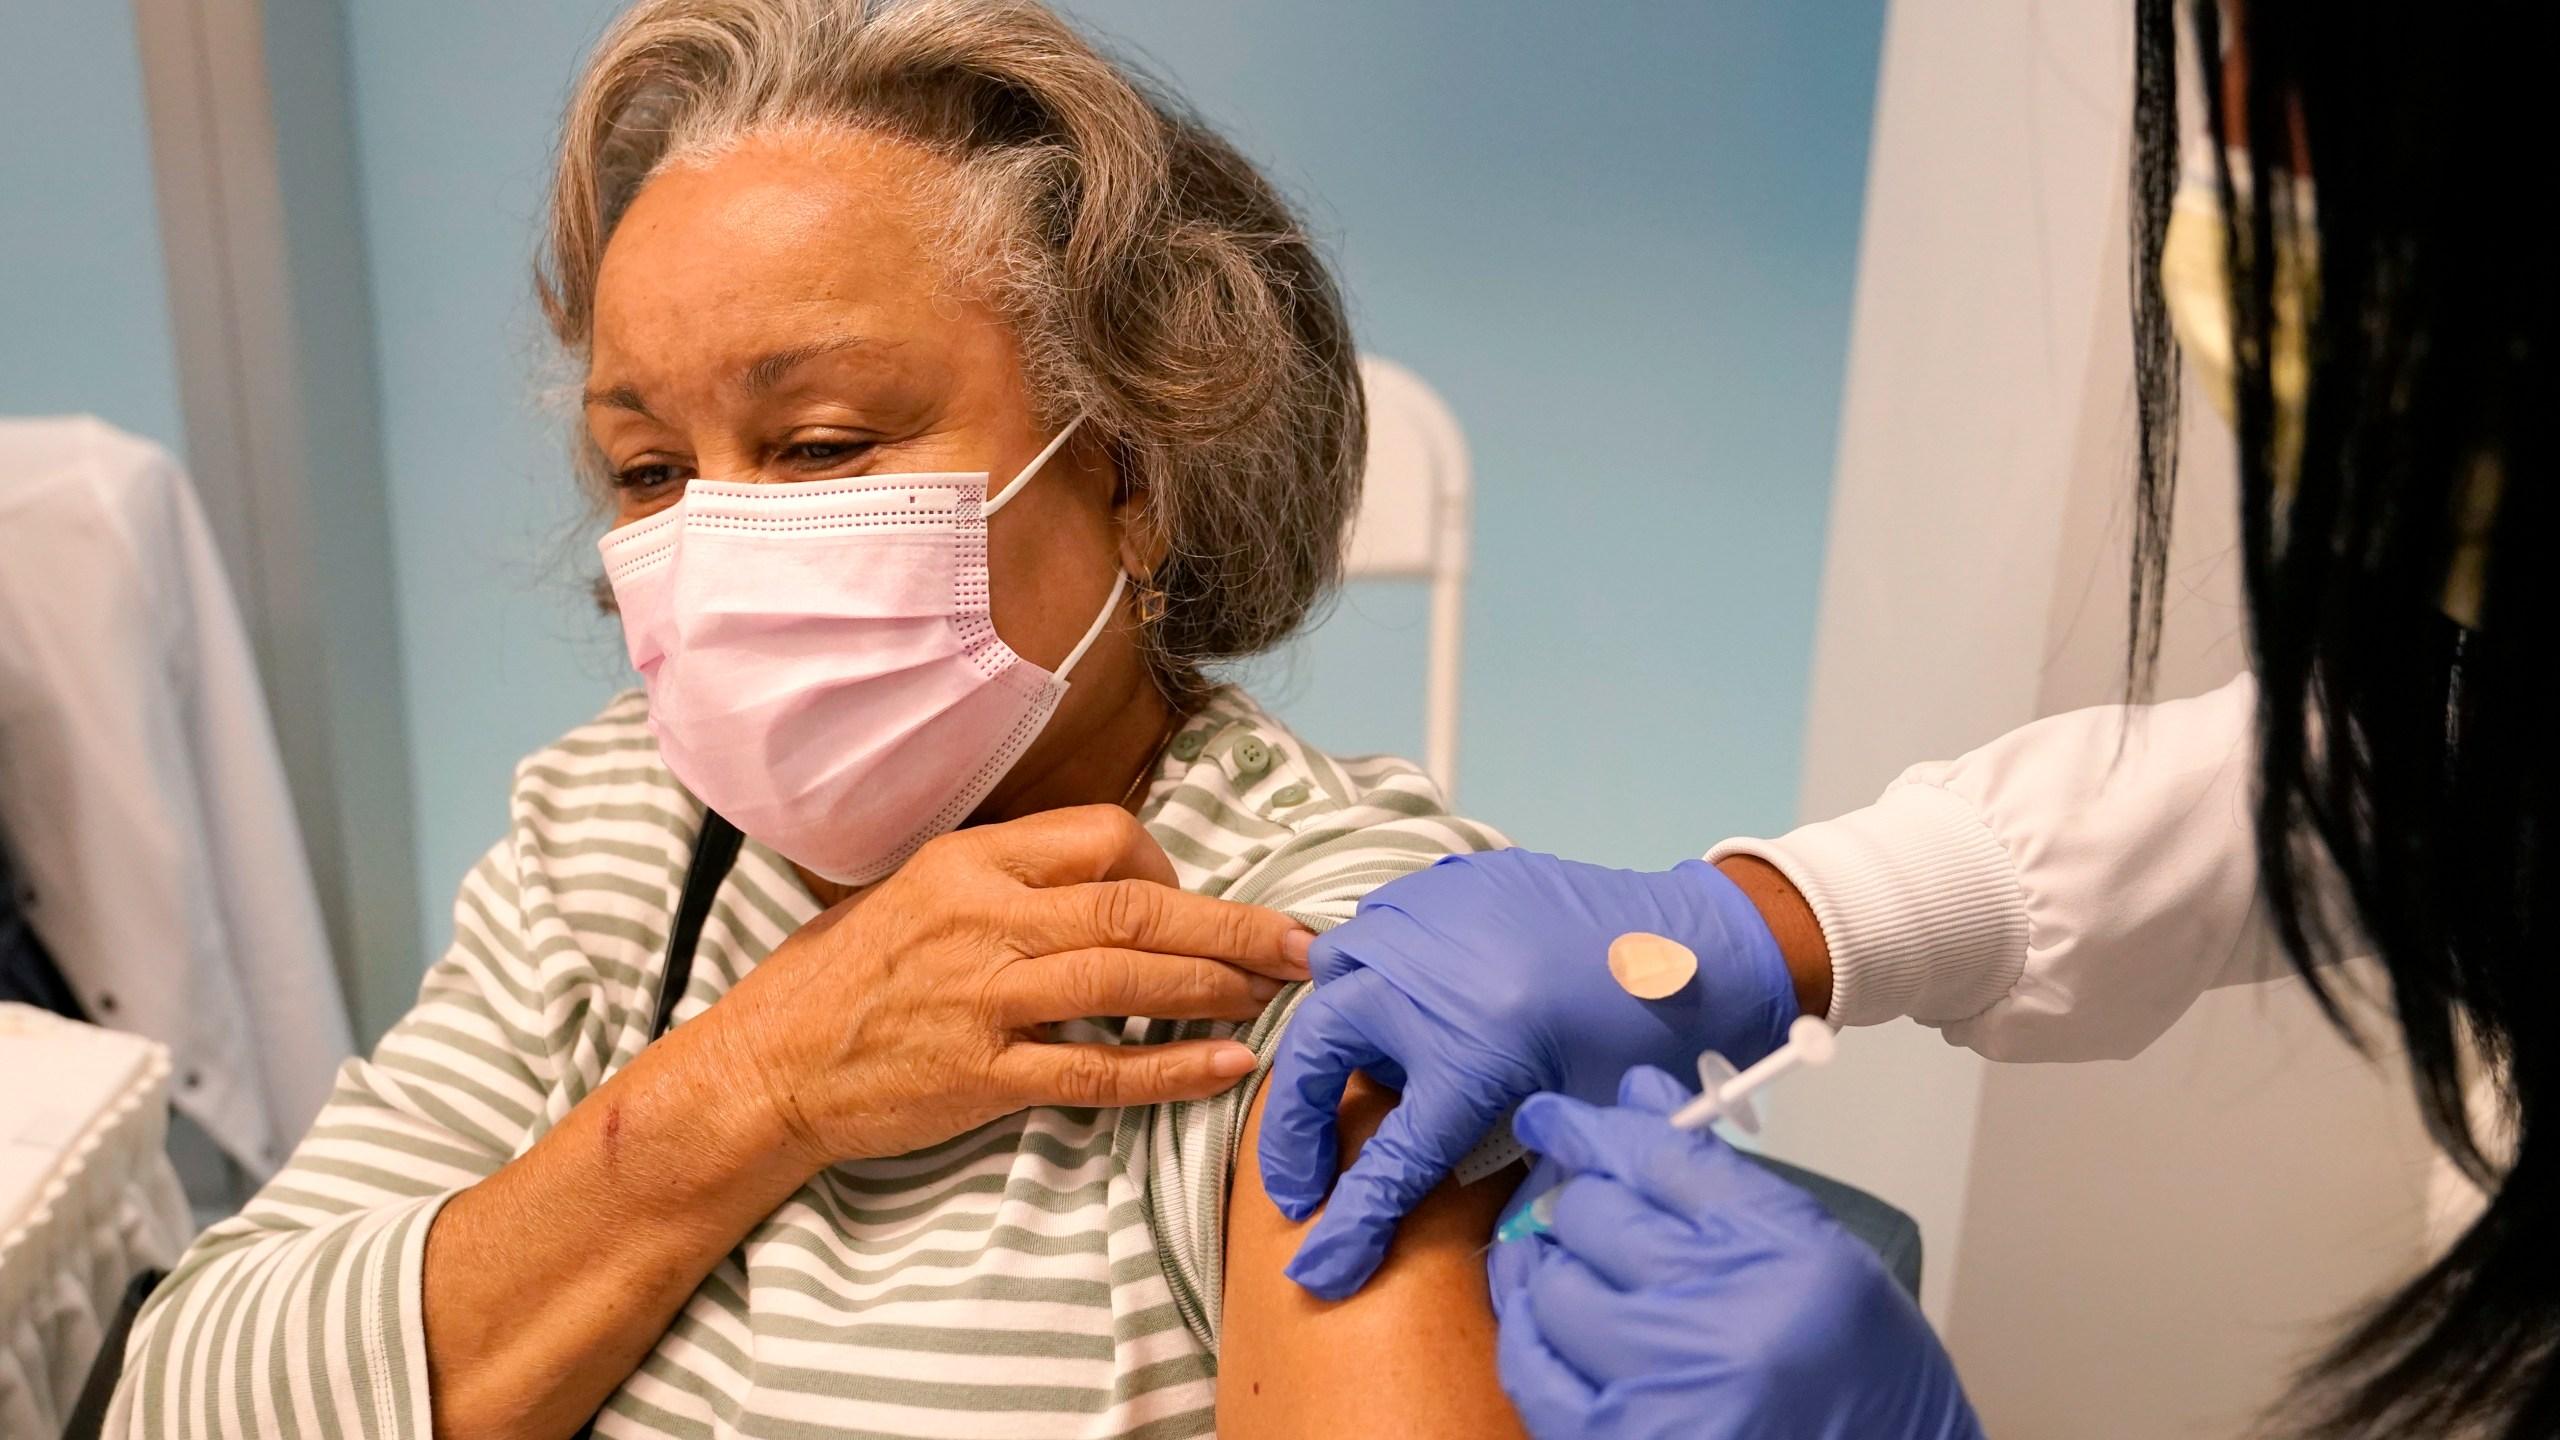 Woman getting COVID vaccine shot